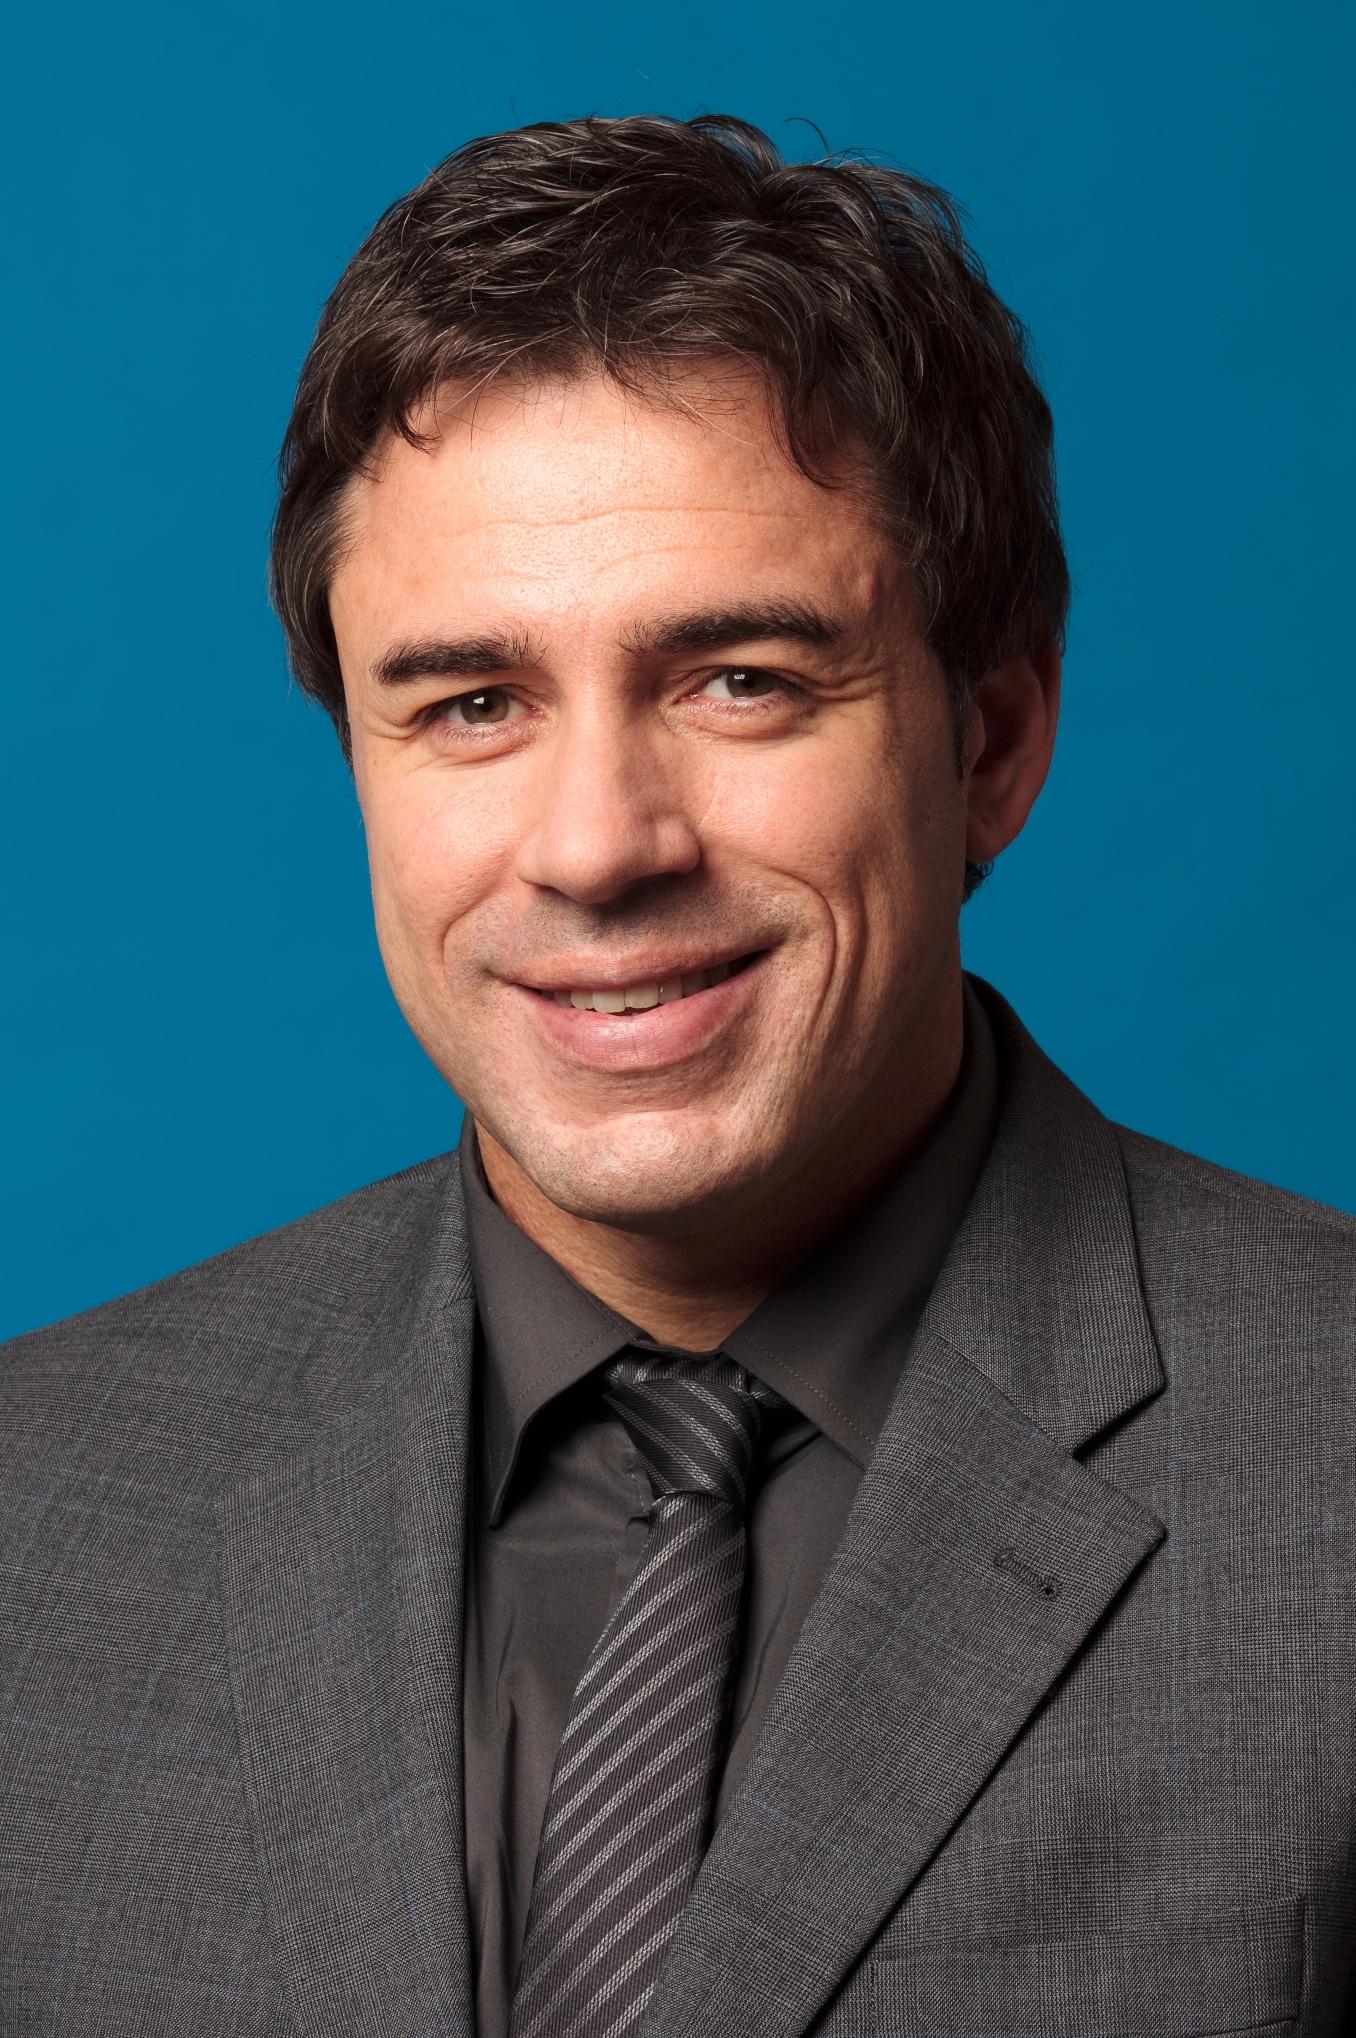 Dirk Lachenmeier, Steuerberater, WP